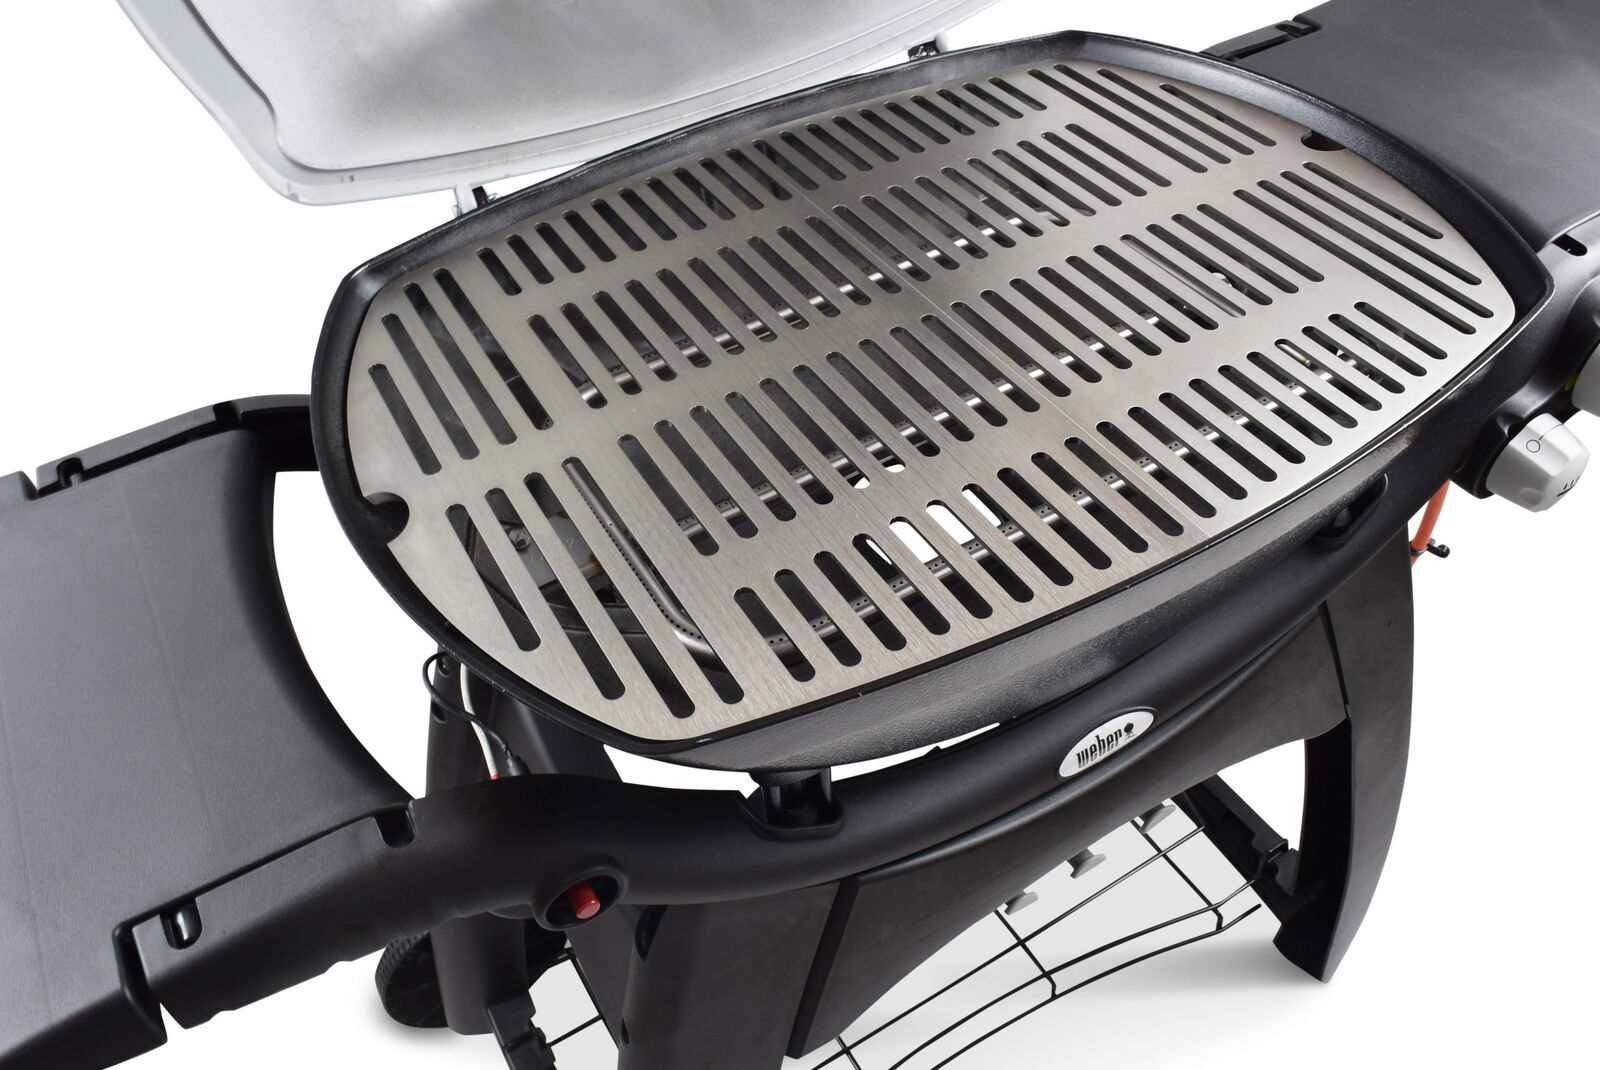 Weber Gasgrill Q 200 Test : Weber grill q200 test vergleich weber grill q200 günstig kaufen!